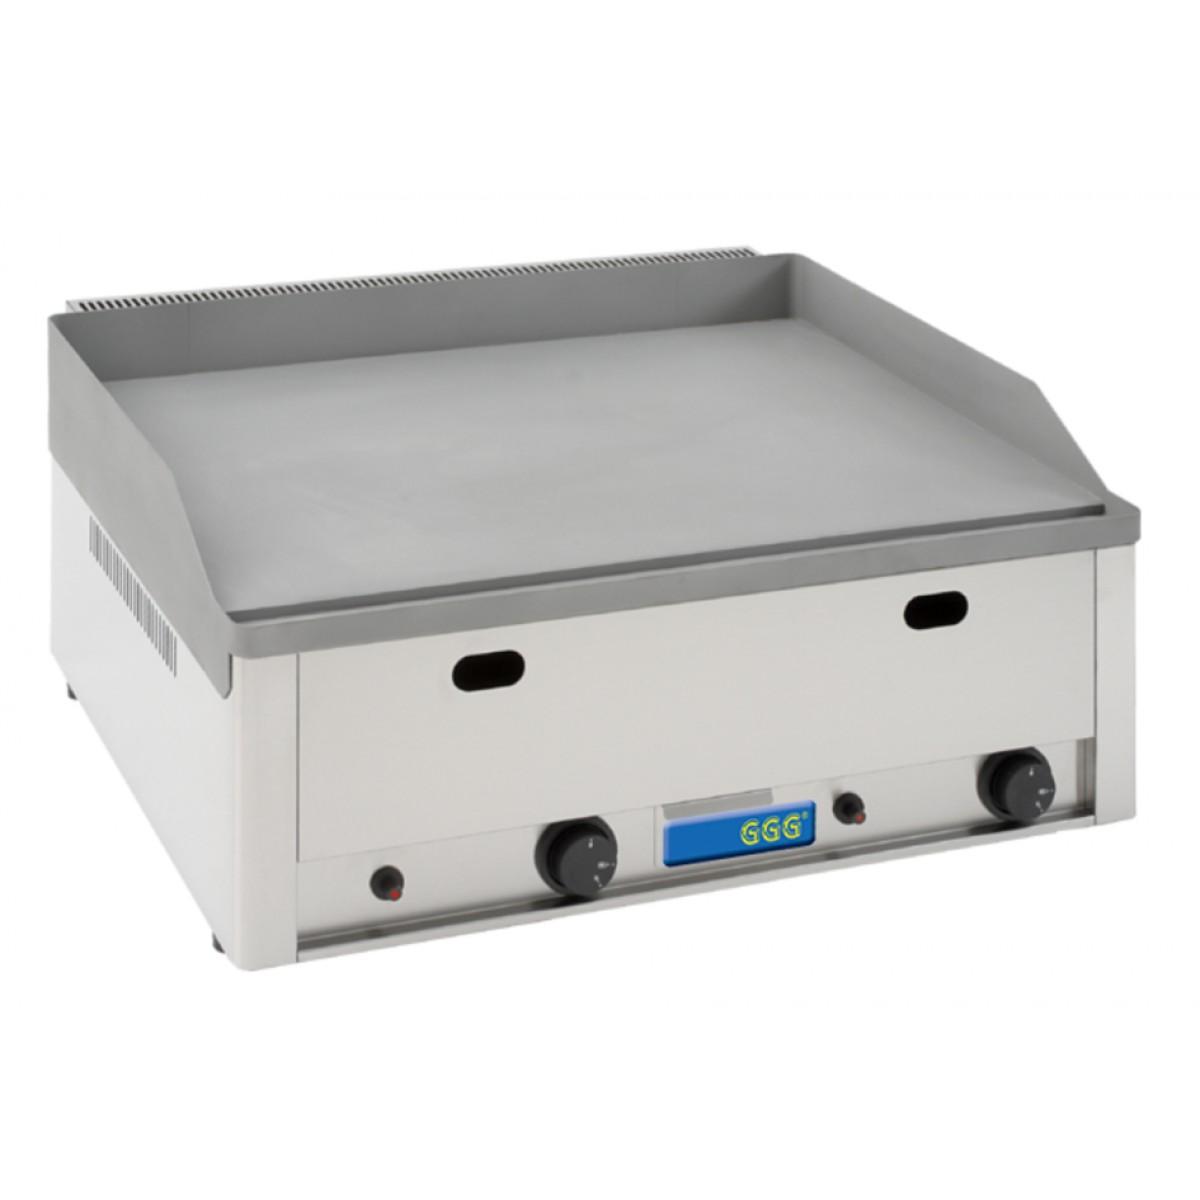 Grillpladeelektrisk-35